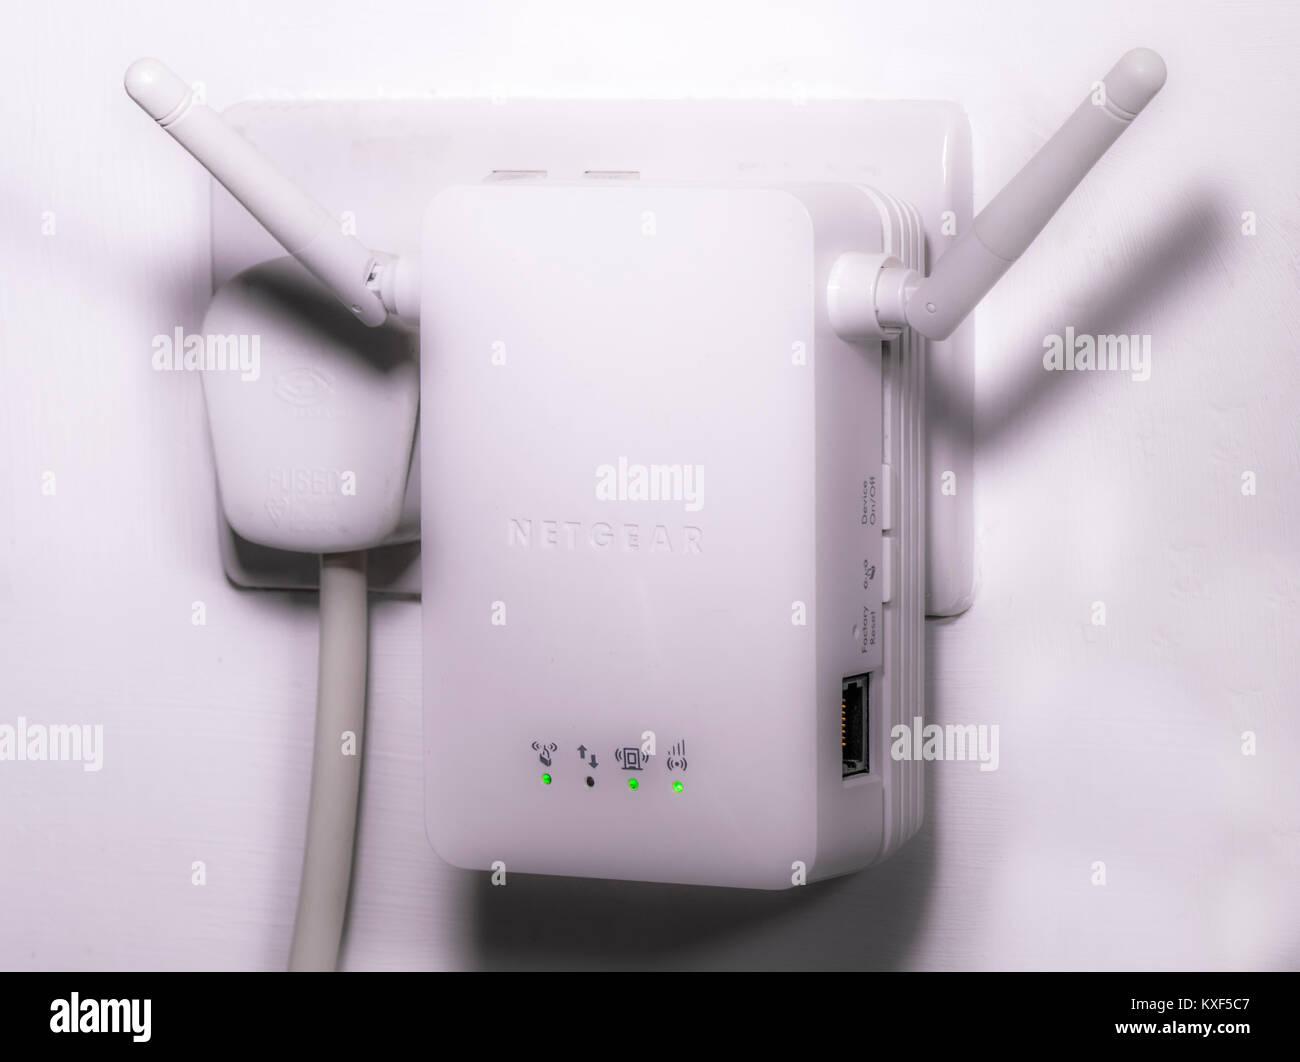 Netgear WLAN/Wi-fi wireless internet Extender, mit zwei Antennen an eine elektrische Steckdose angeschlossen, mit Stockbild